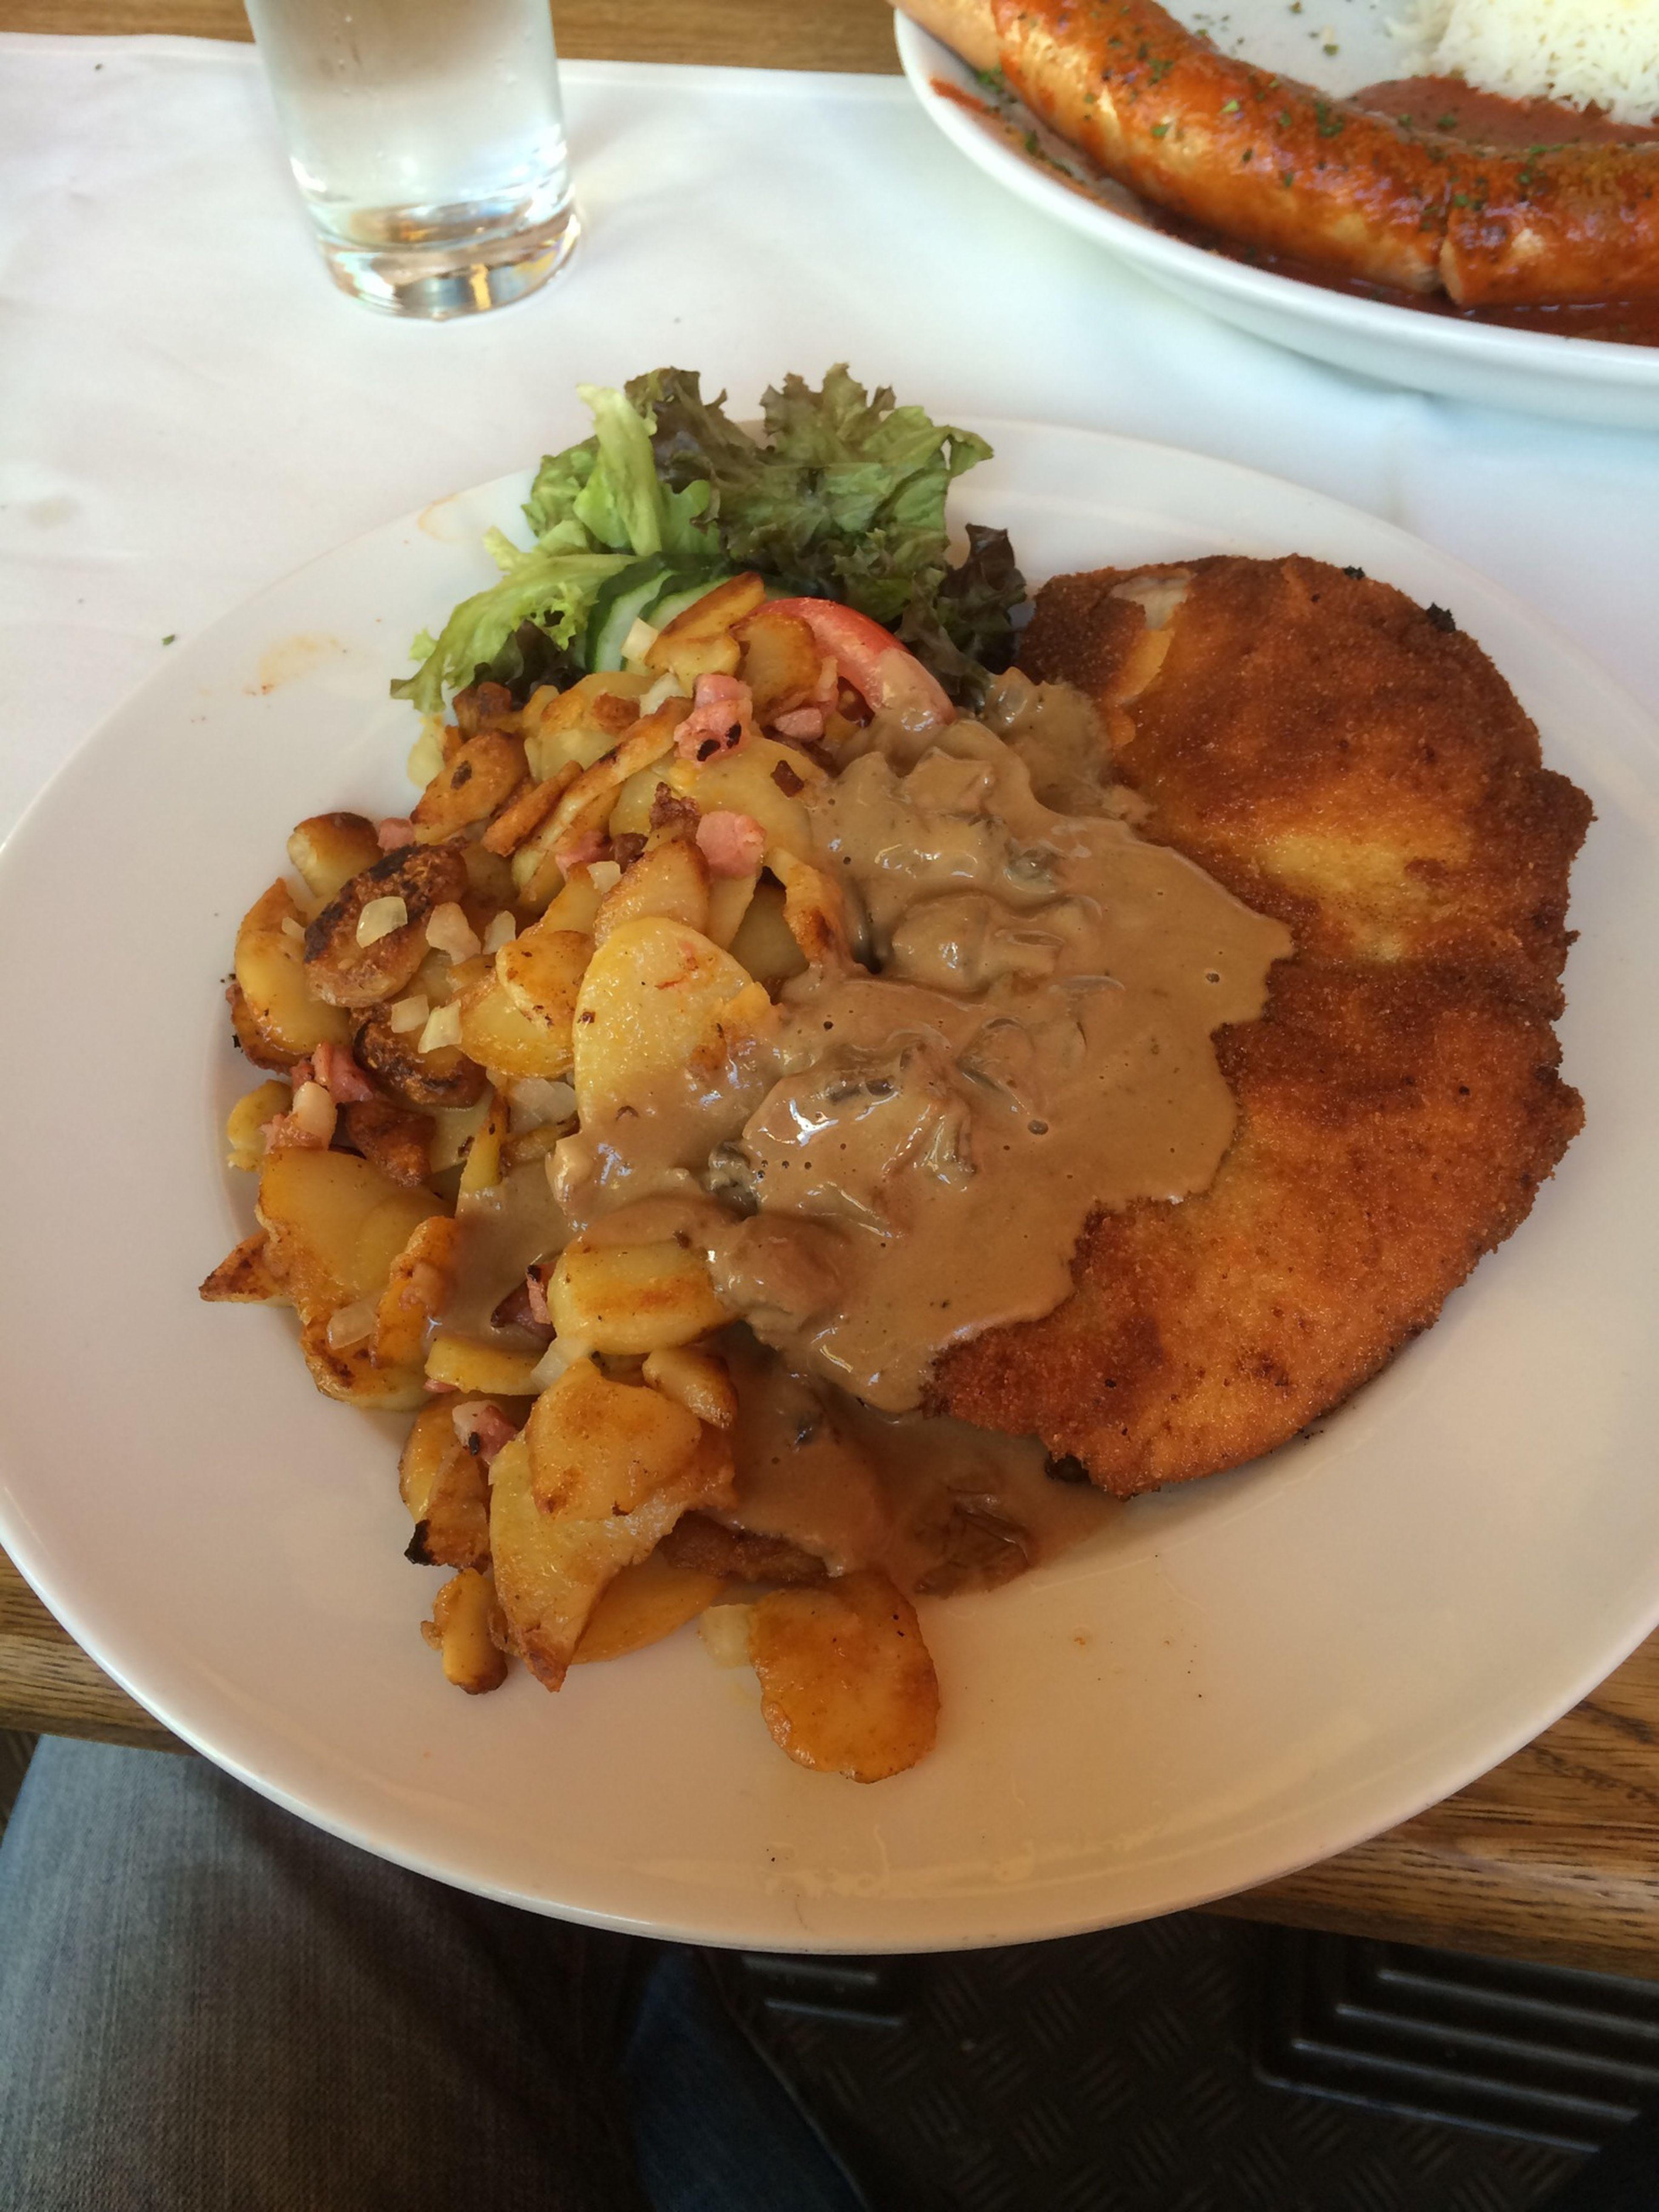 Lecker Schnitzel mit Bratkartoffeln Eating Berlin